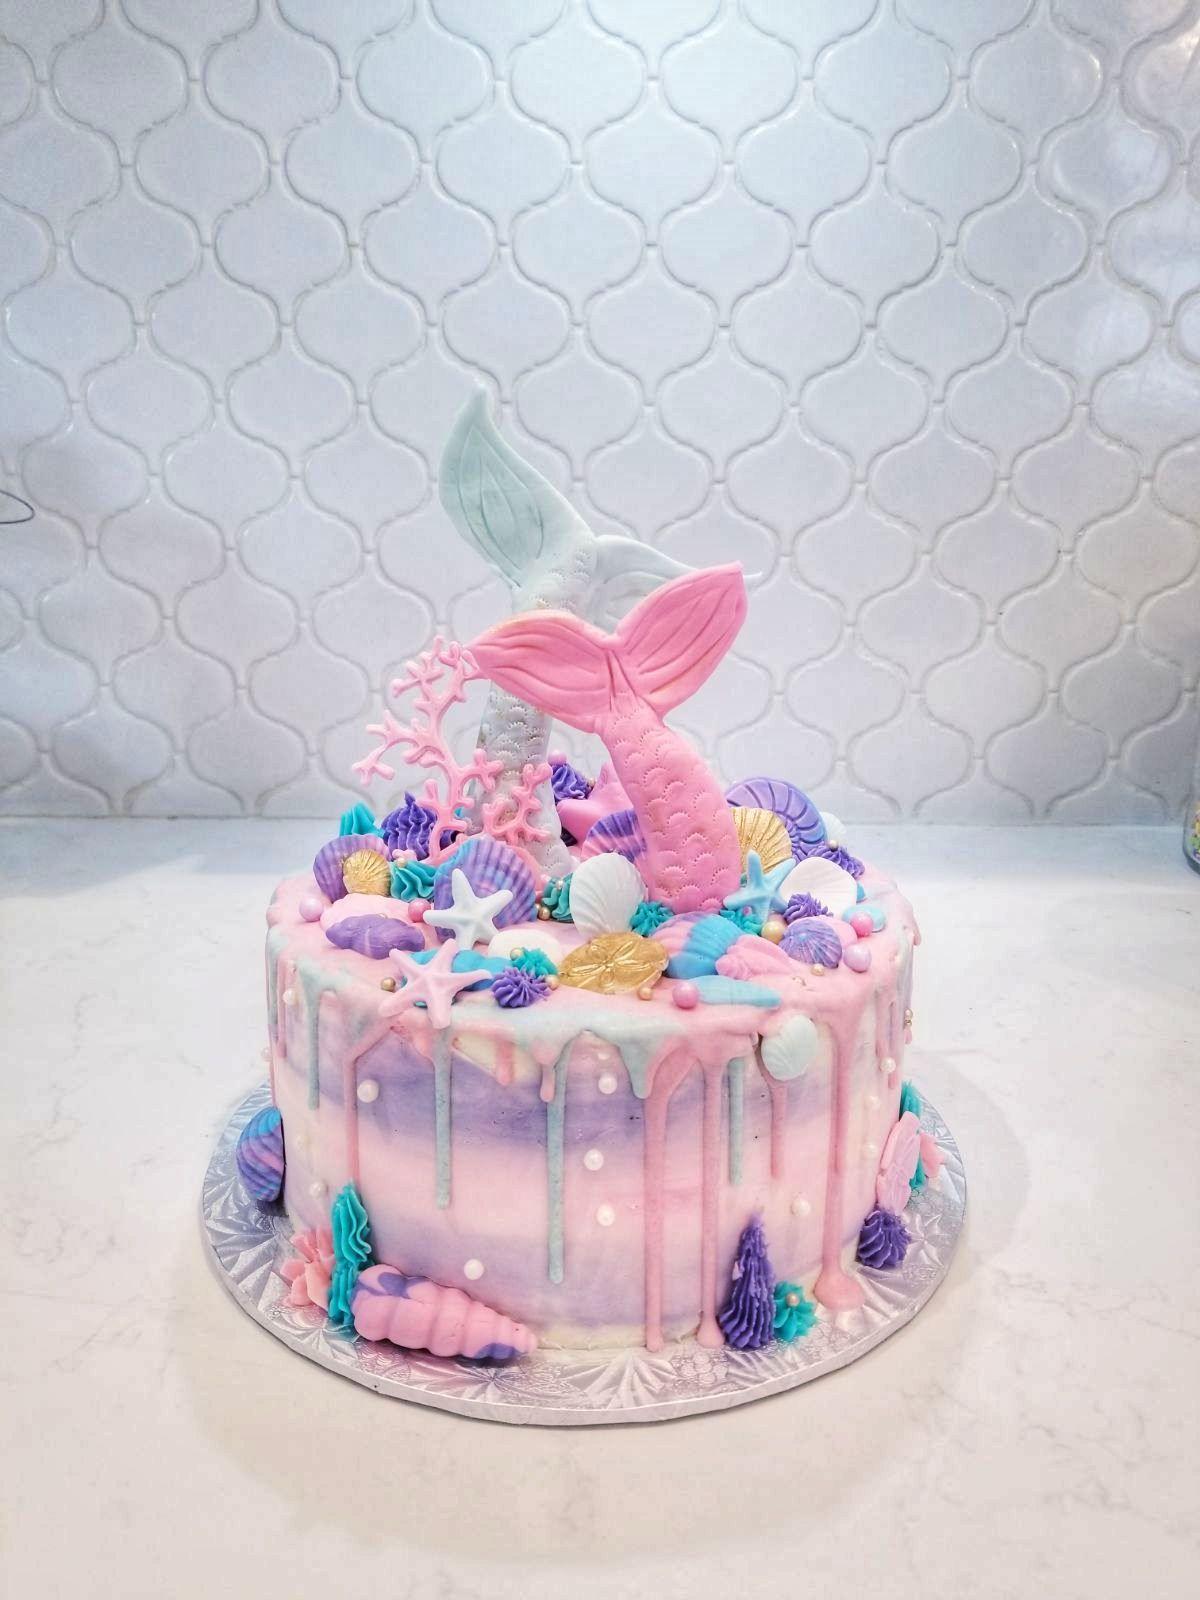 Delicious And Quick Recipes Mermaid Birthday Cakes Mermaid Cakes